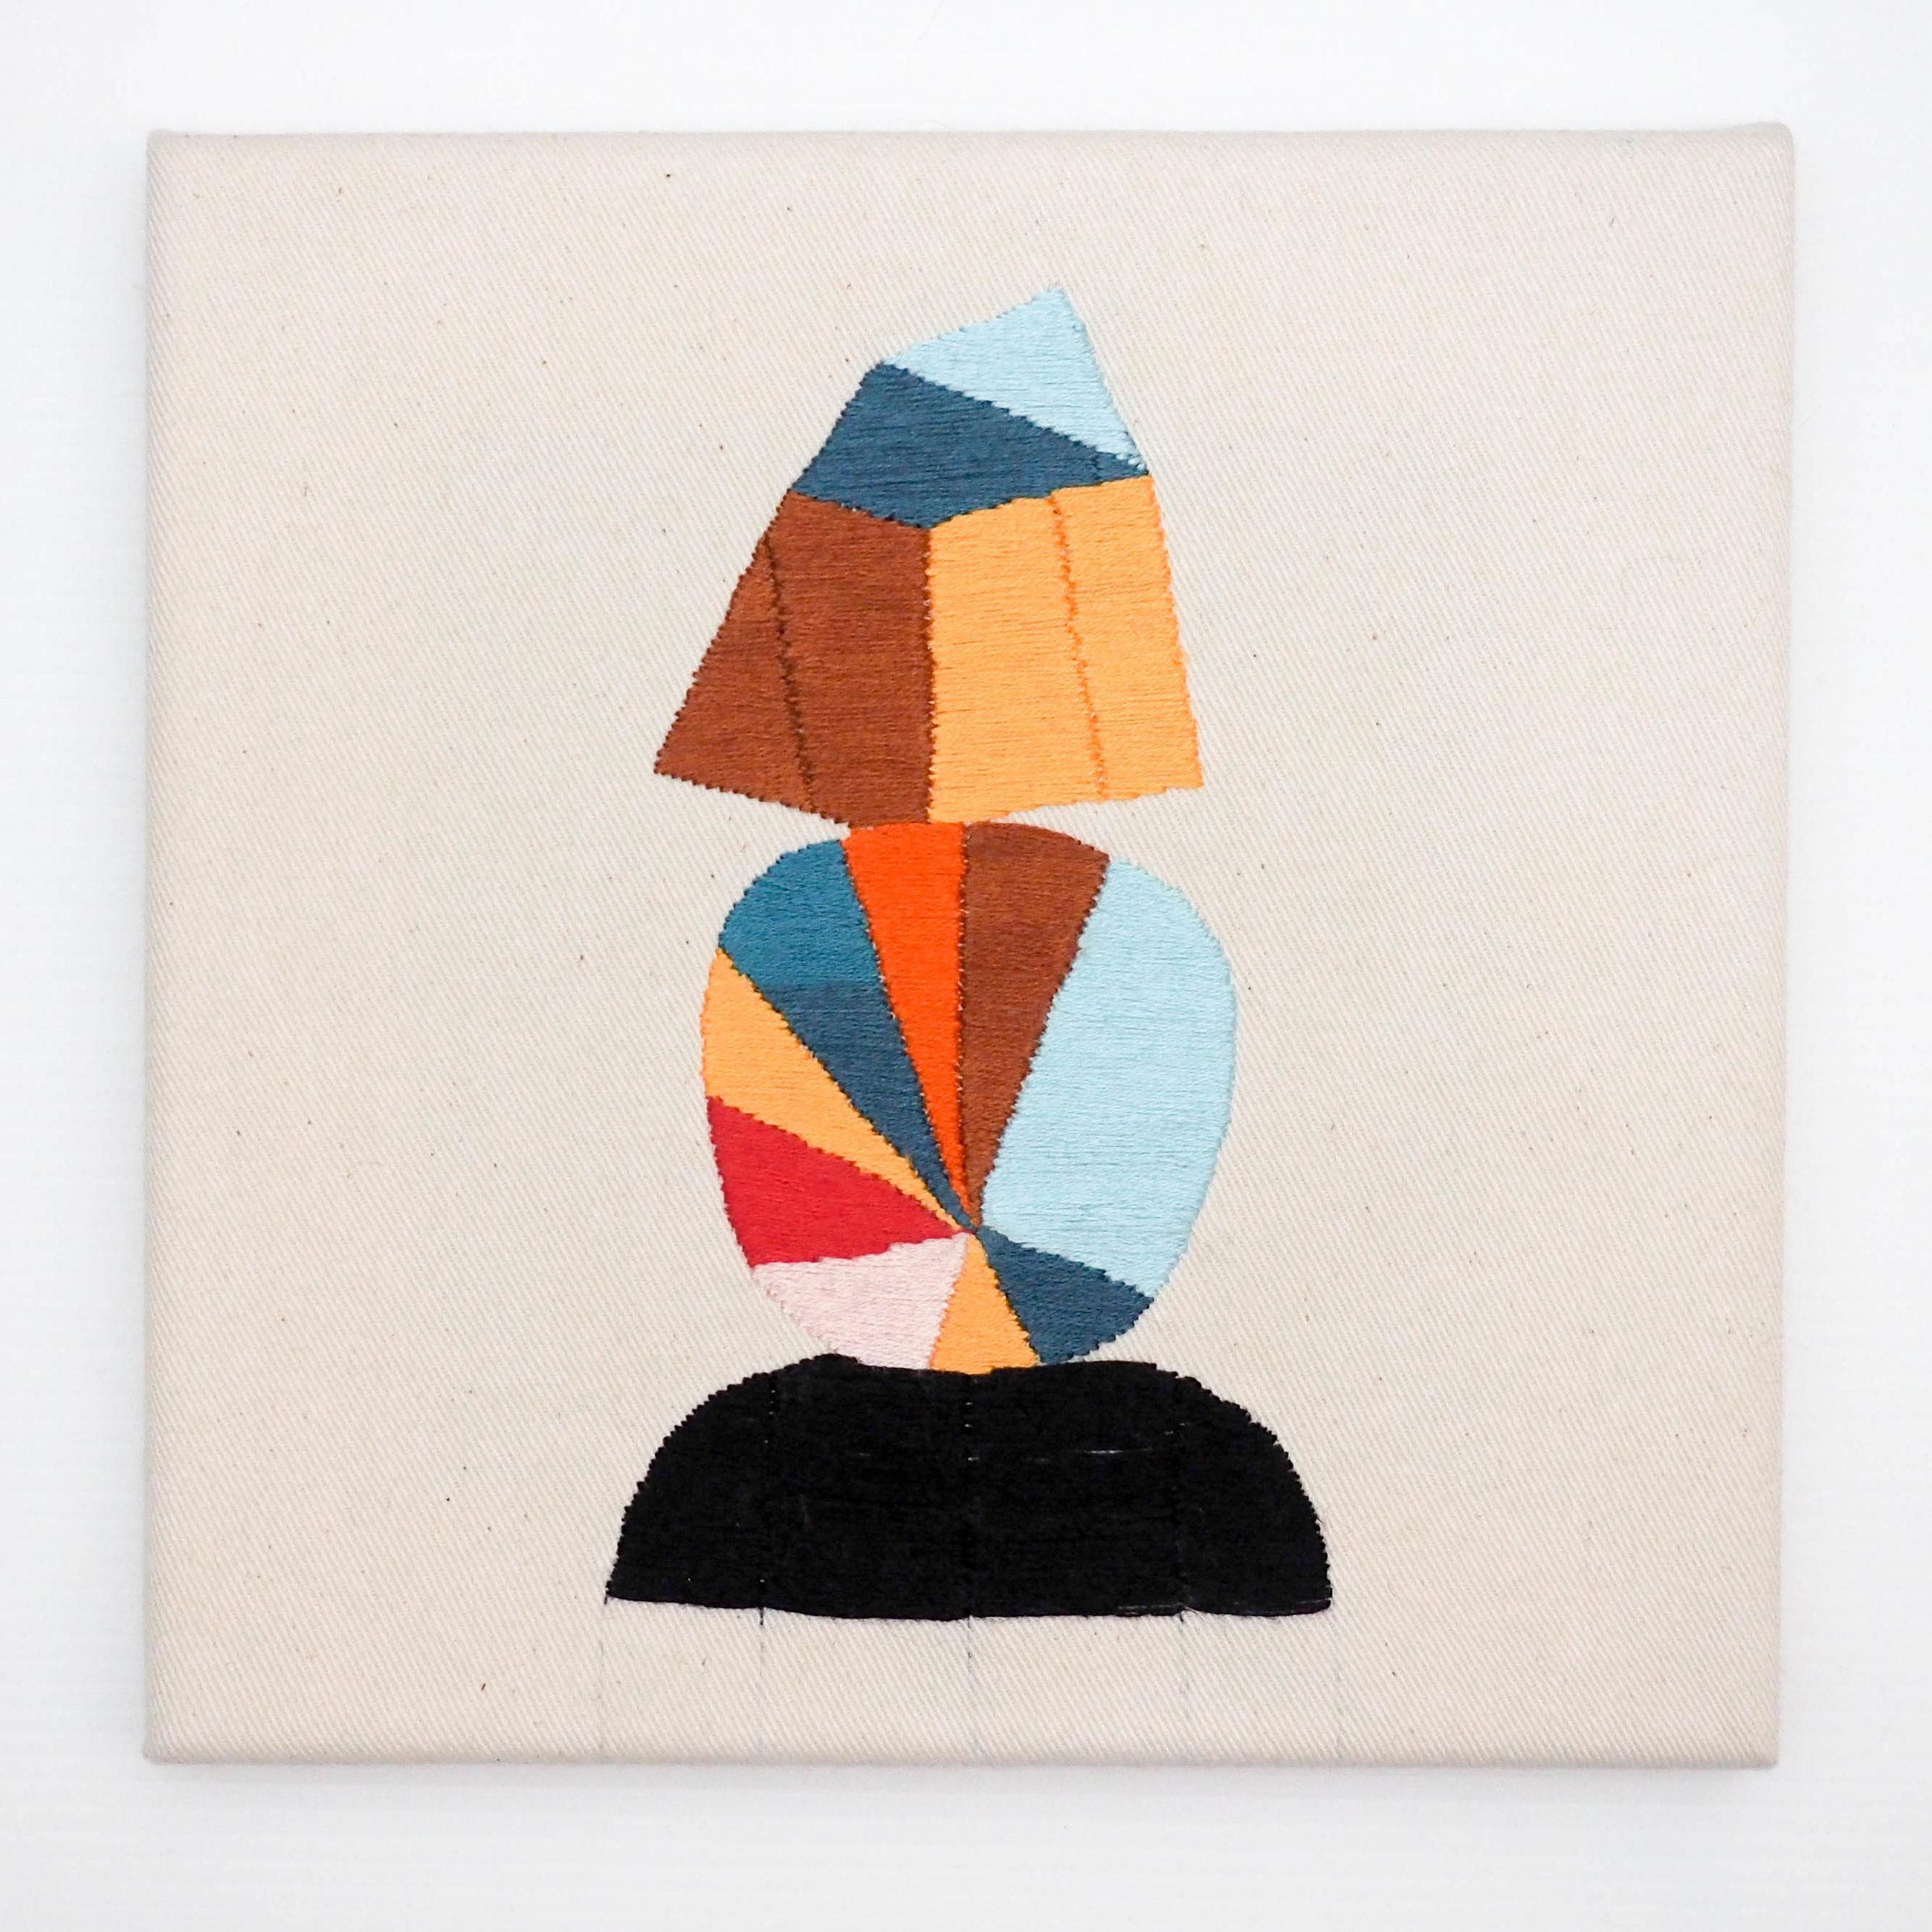 Castalian Order  Hand embroidery on fabric, 2017 20 x 20 cm